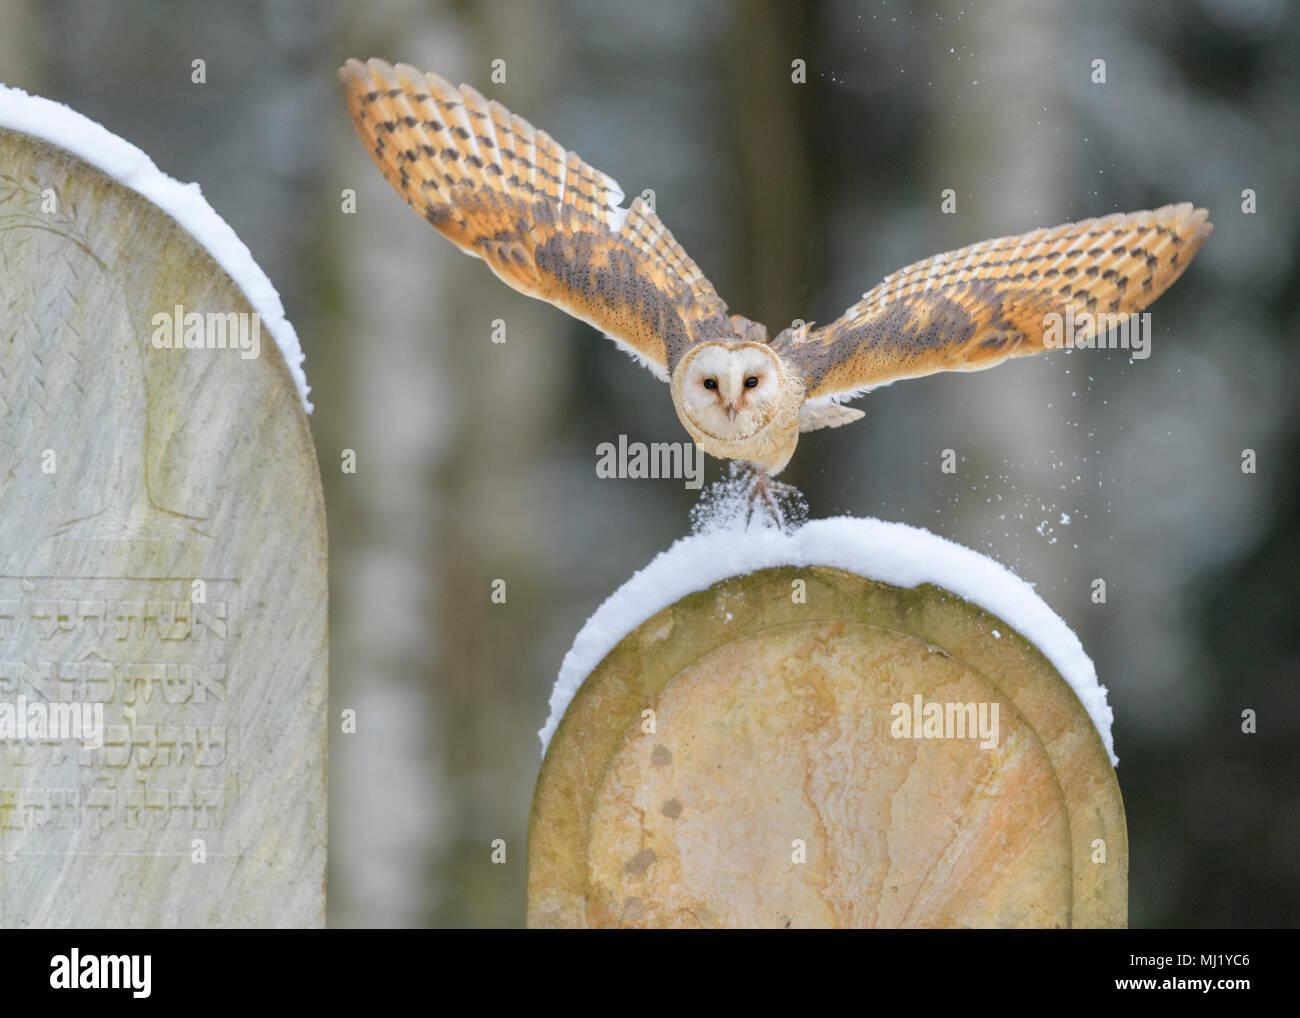 Common barn owl (Tyto alba), flying over snow-covered gravestones in a cemetery, Moravia, Czech Republic Stock Photo